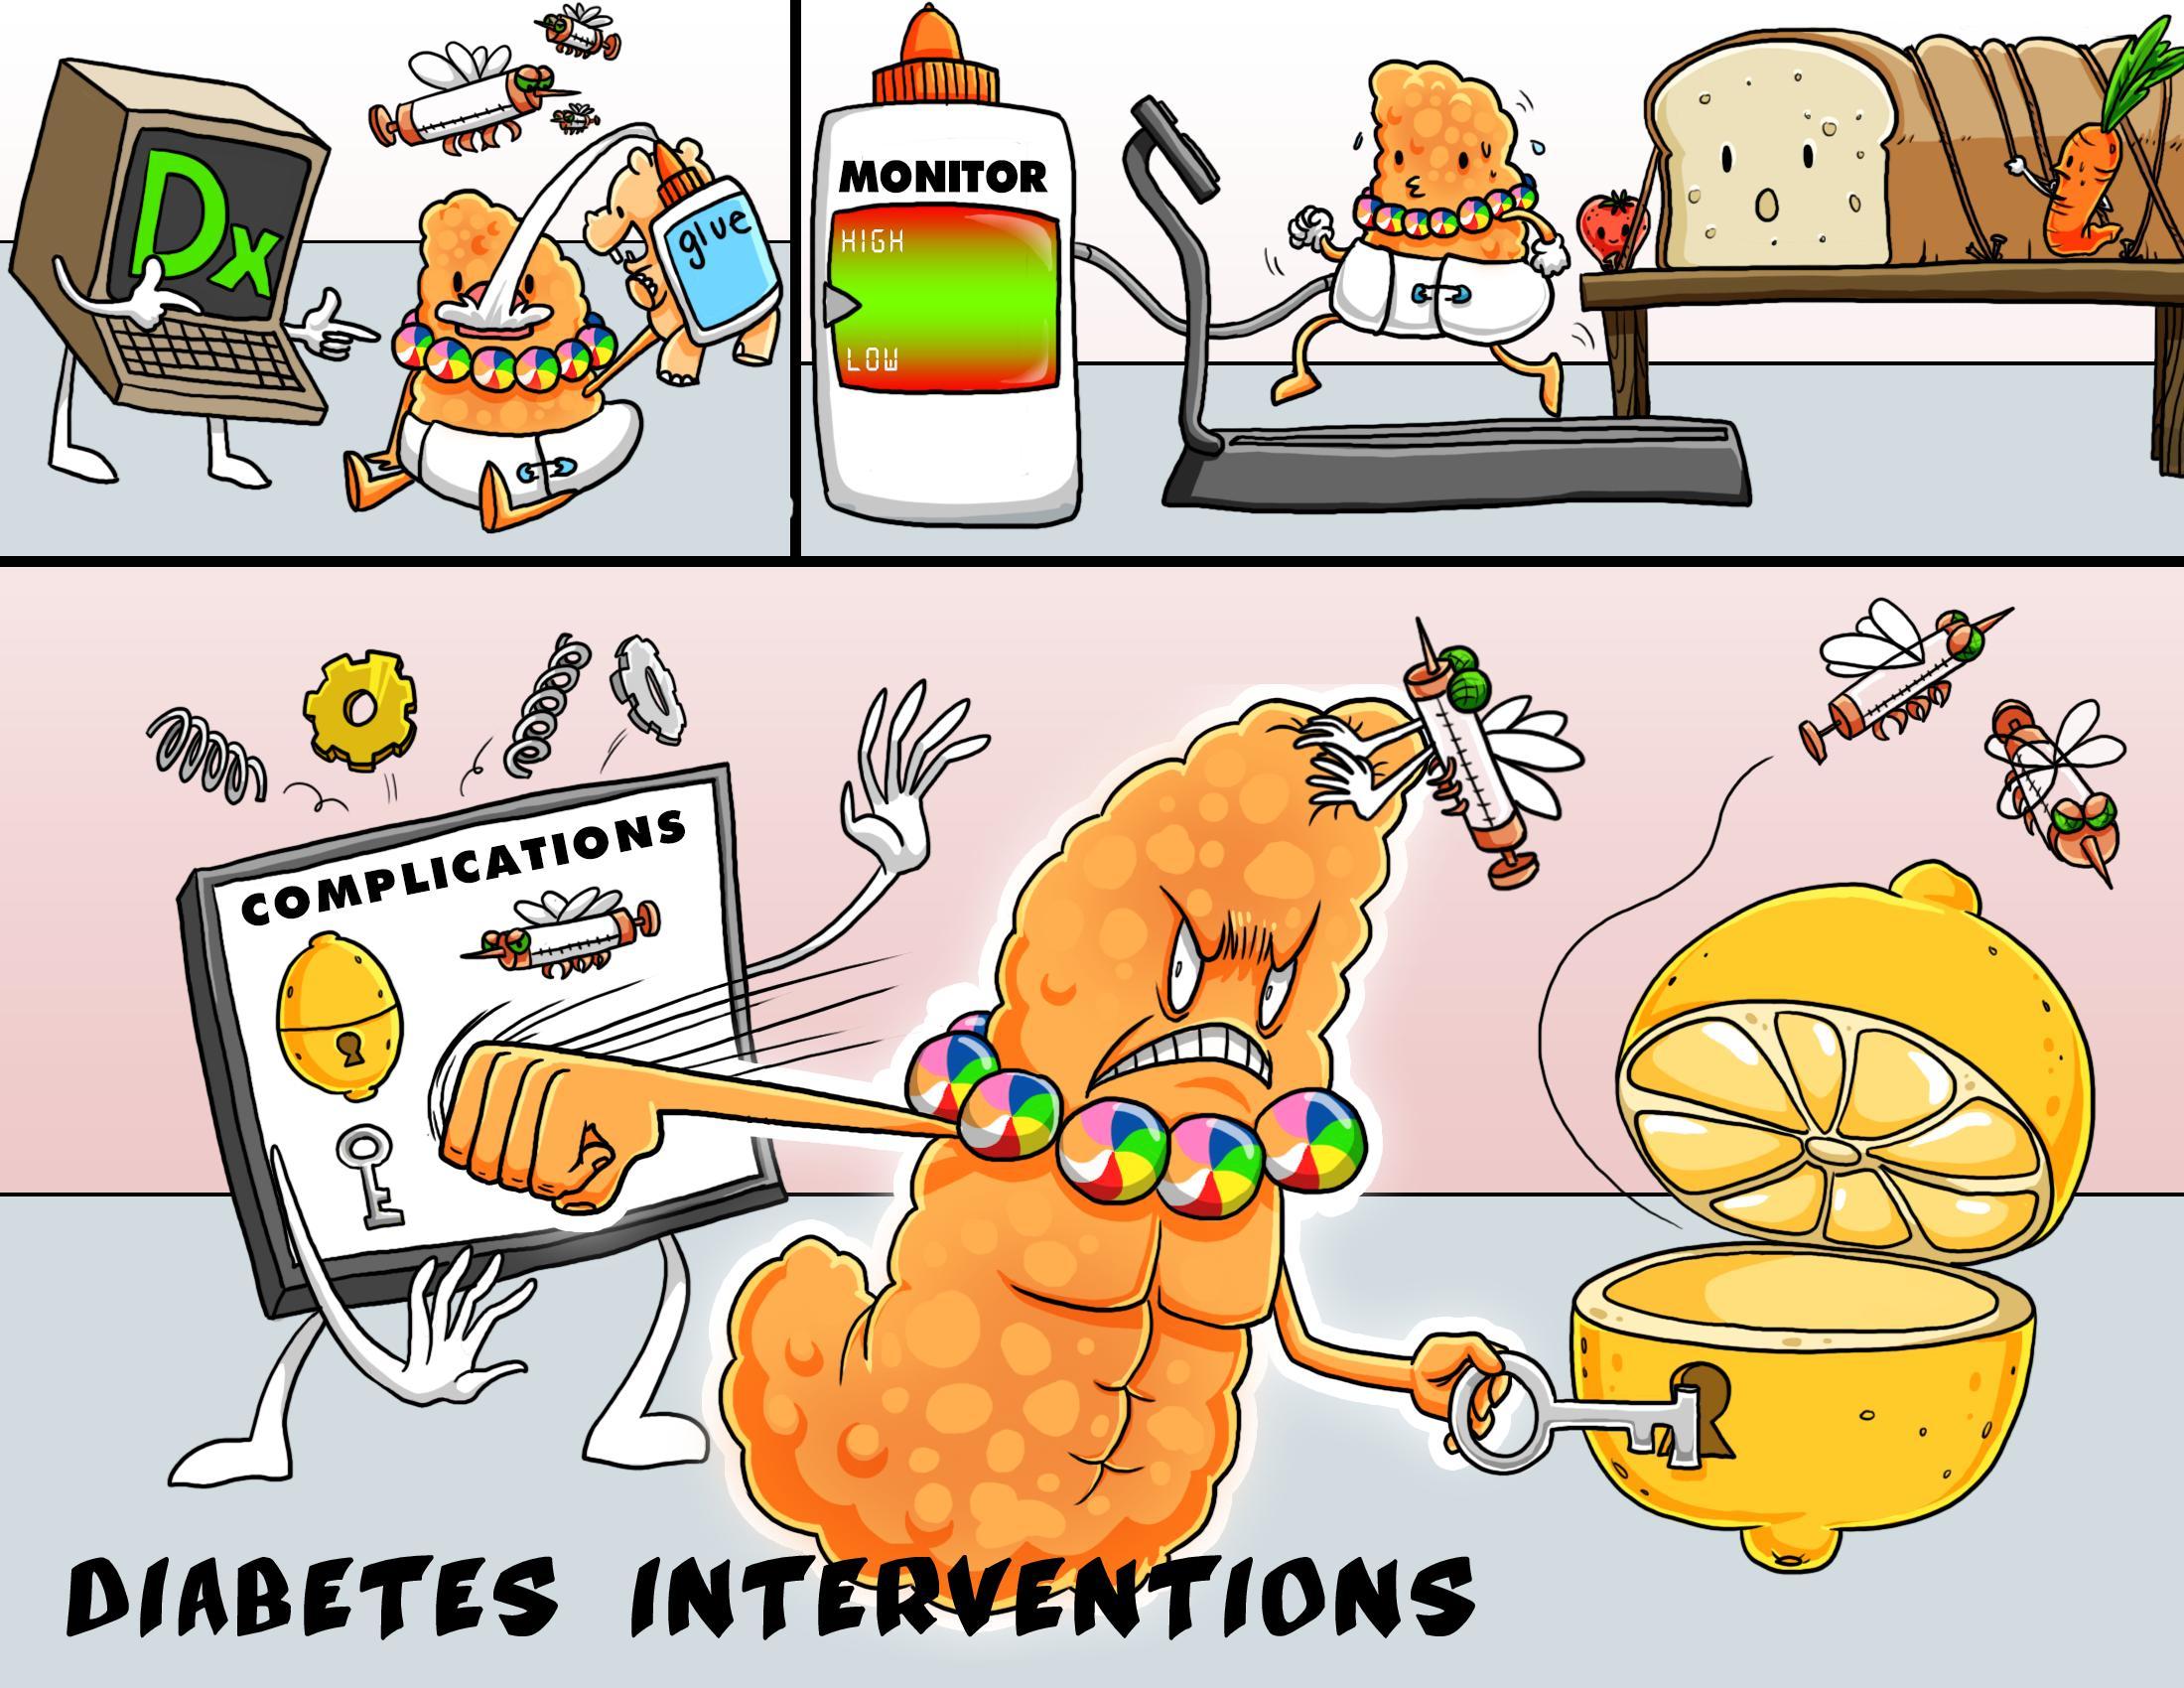 Diabetes Interventions